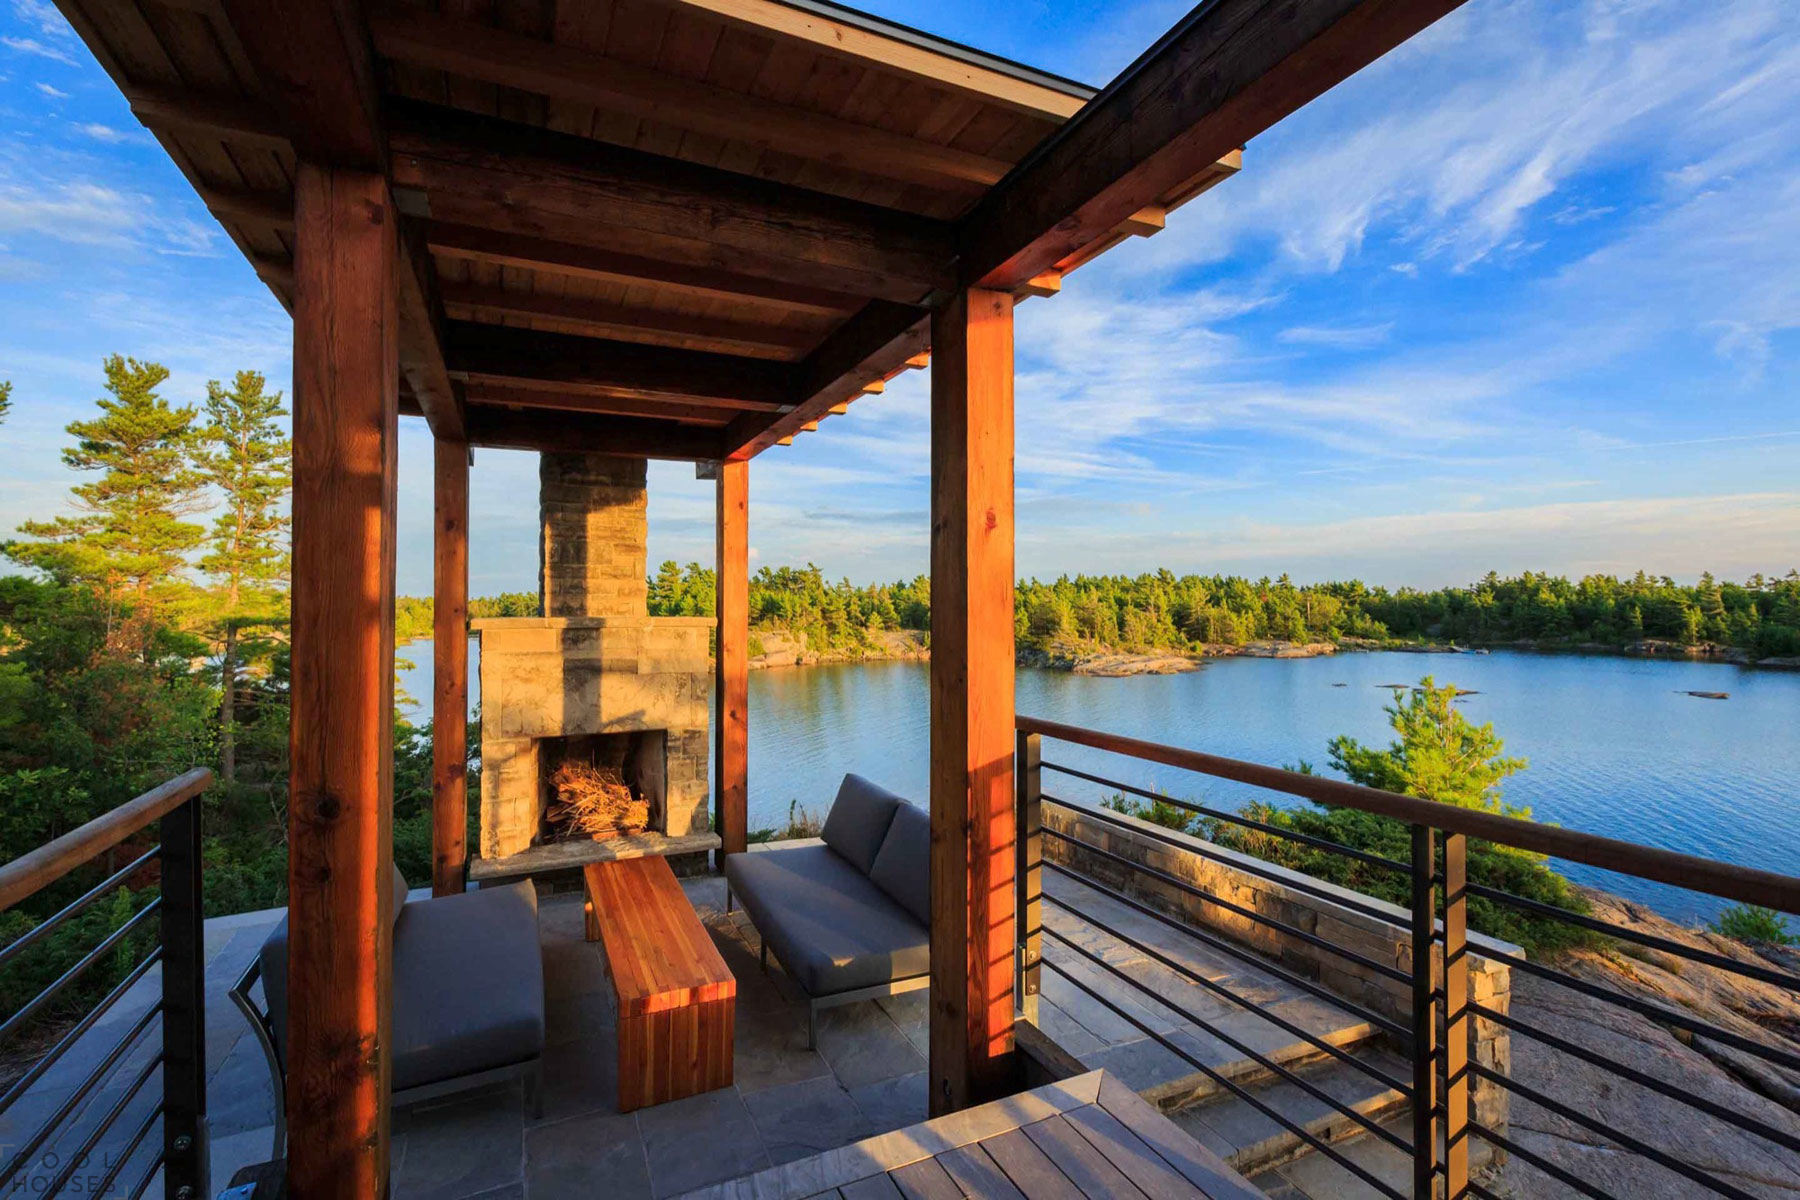 Эко-дом на скалистом берегу озера в Онтарио, Канада